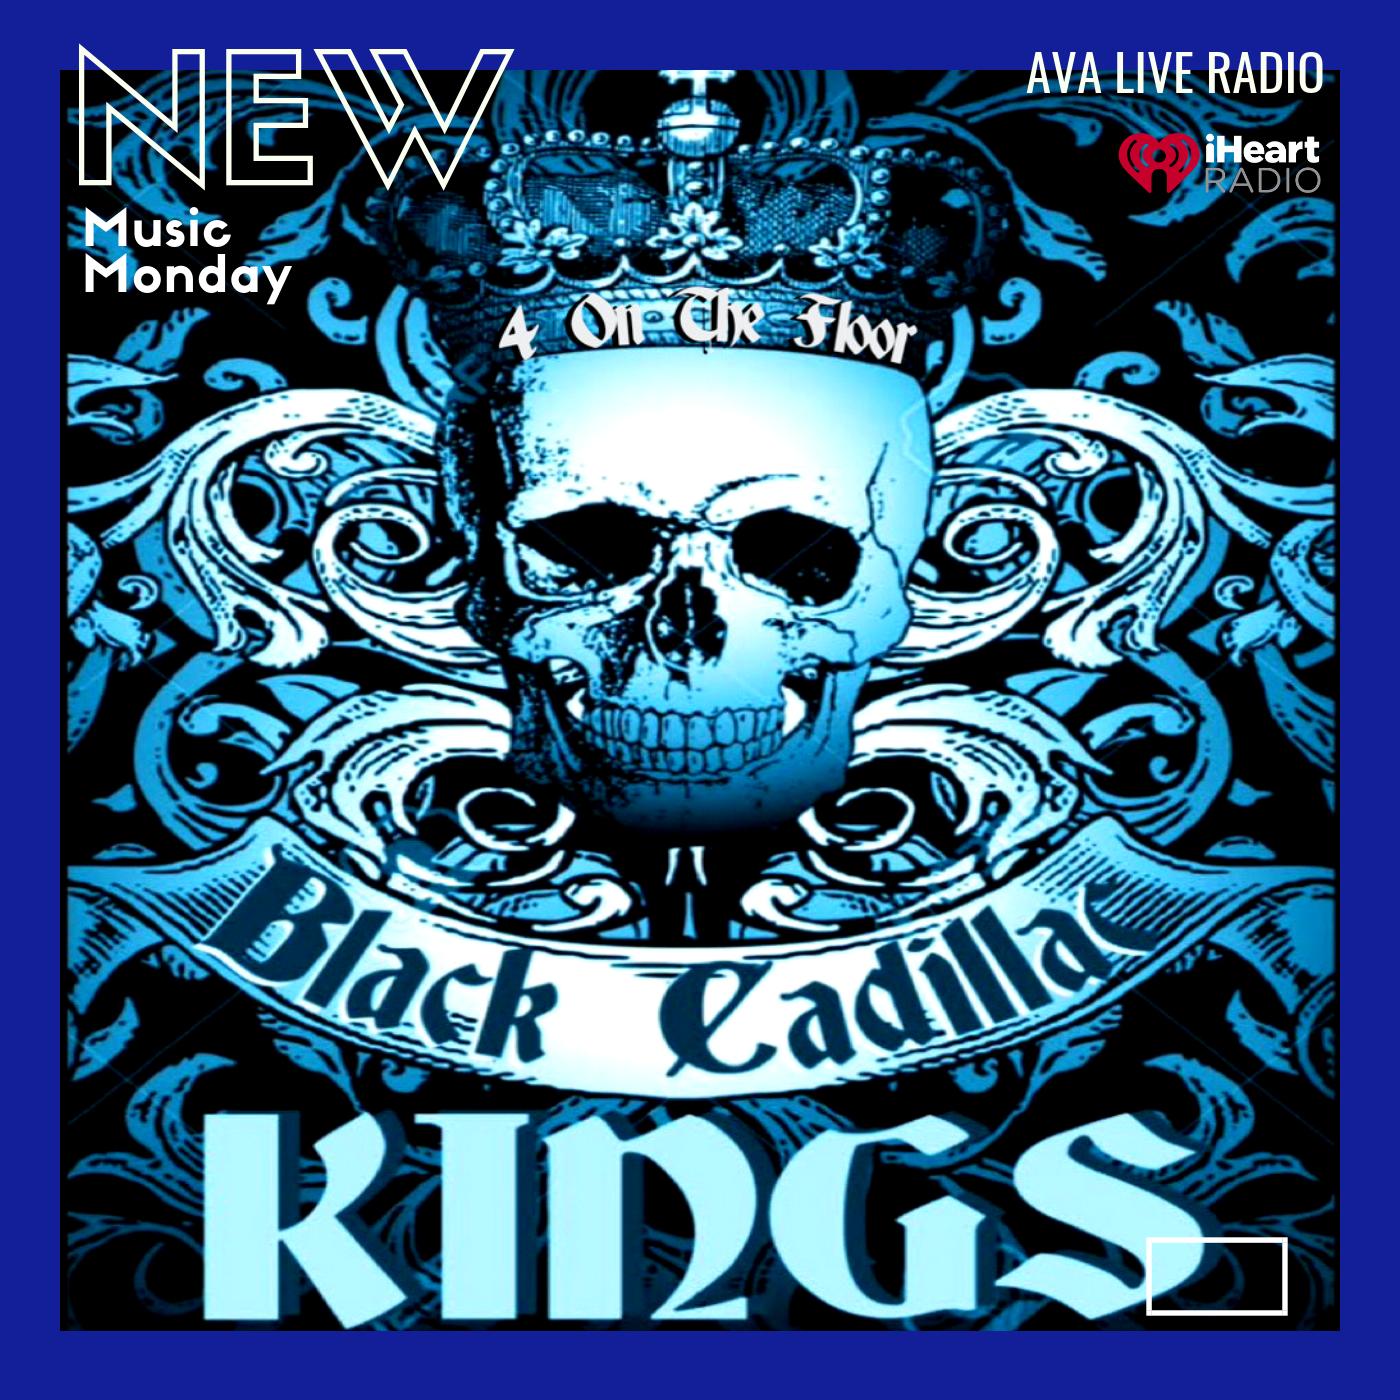 Black cadillac kings avaliveradio.png